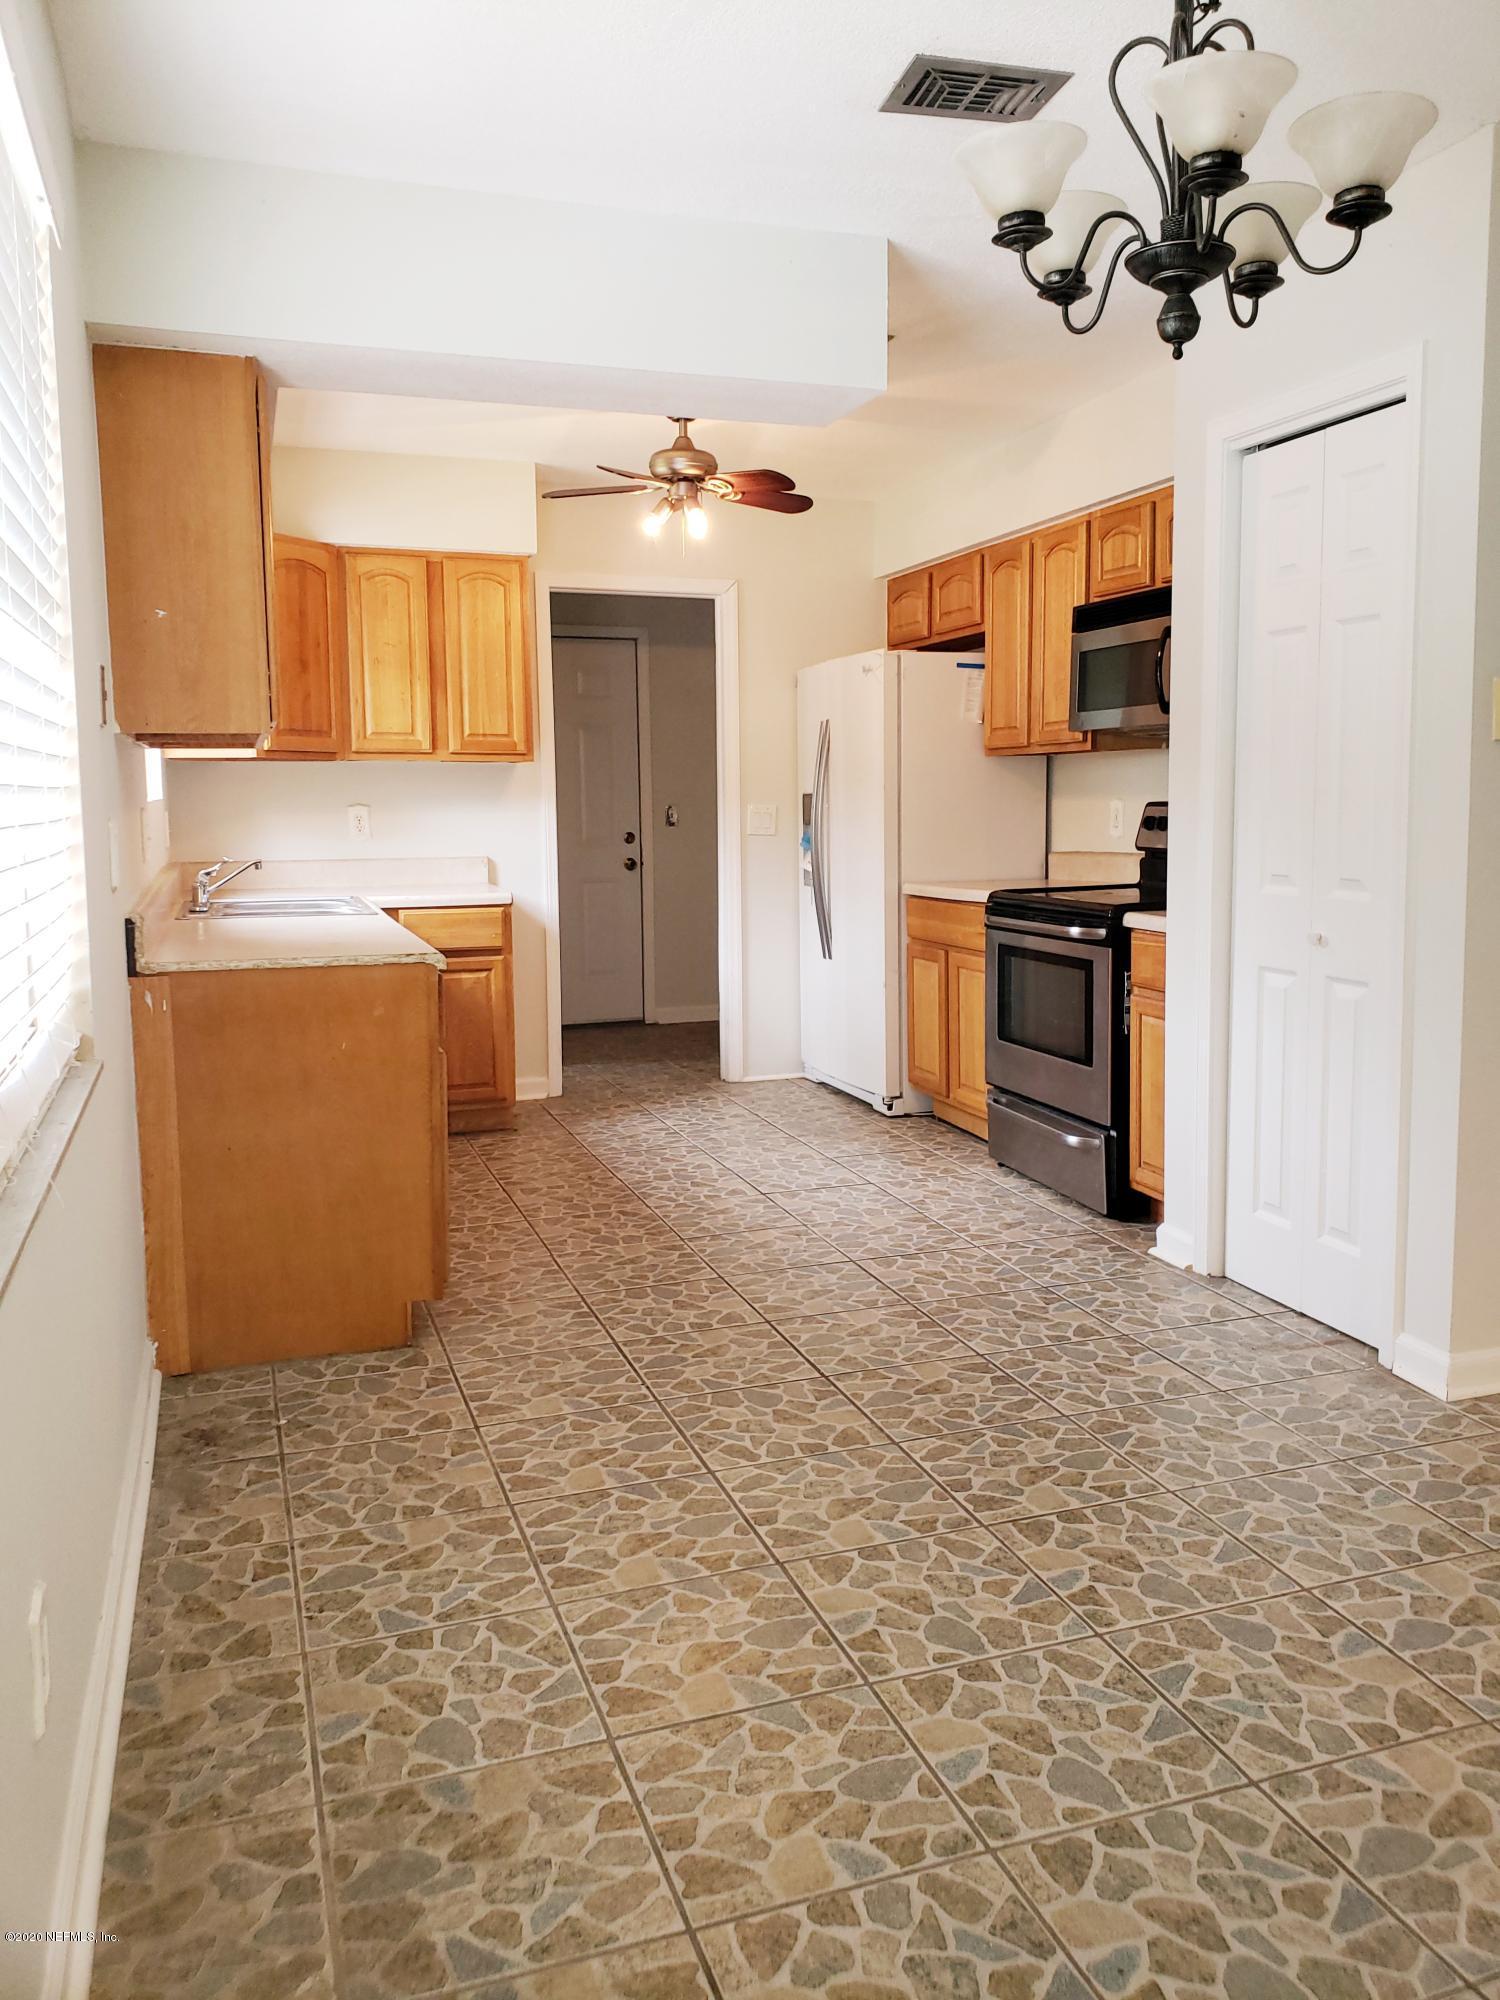 4084 BRIAR FOREST, JACKSONVILLE, FLORIDA 32277, 3 Bedrooms Bedrooms, ,2 BathroomsBathrooms,Residential,For sale,BRIAR FOREST,1073165